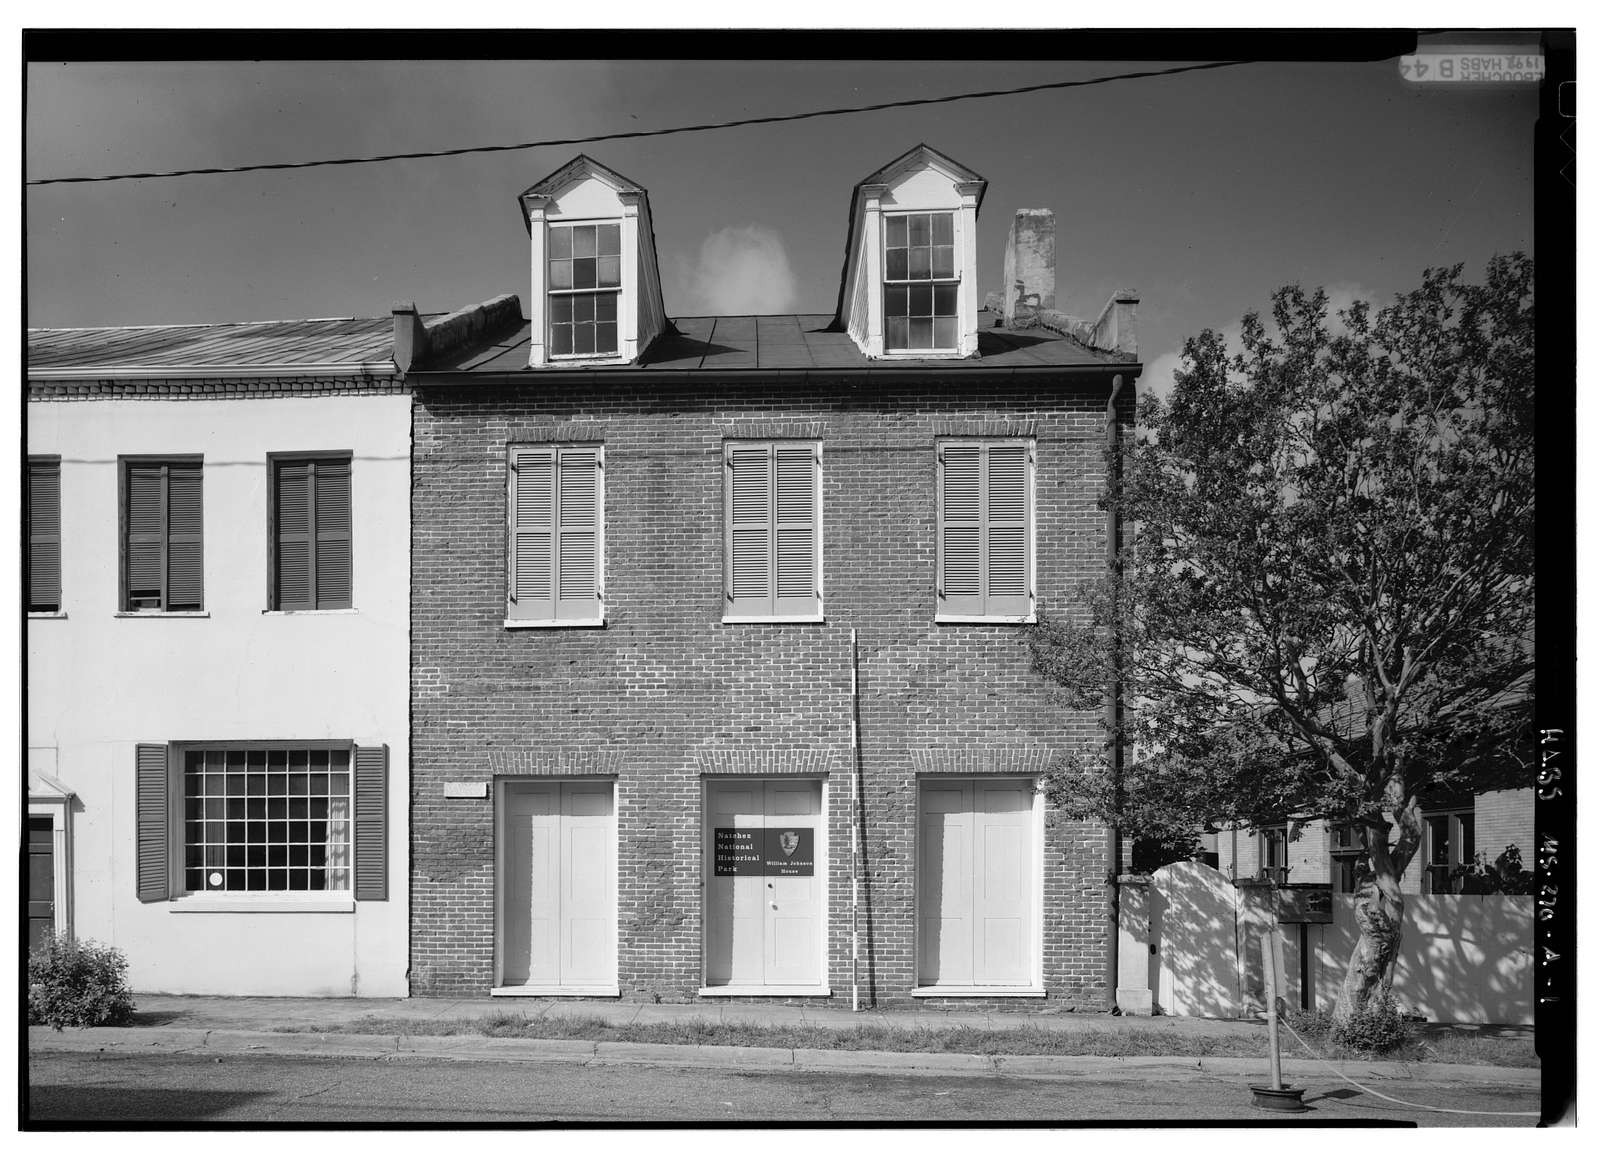 Johnson & McCallum Houses, William Johnson House, 210 State Street, Natchez, Adams County, MS